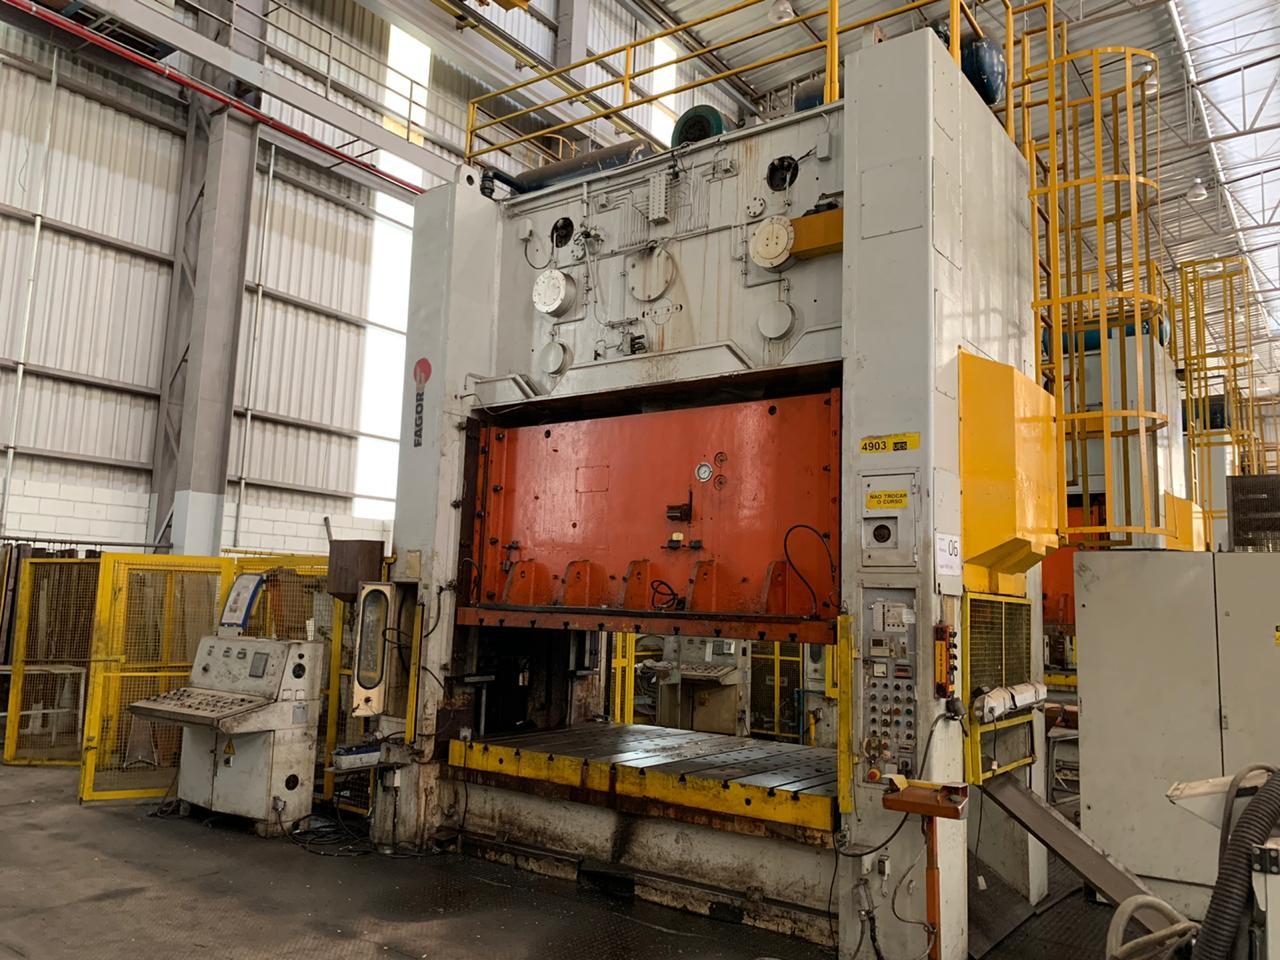 P7-Prensa Excêntrica H Gutmann 400 ton, 2800mm x 1600mm